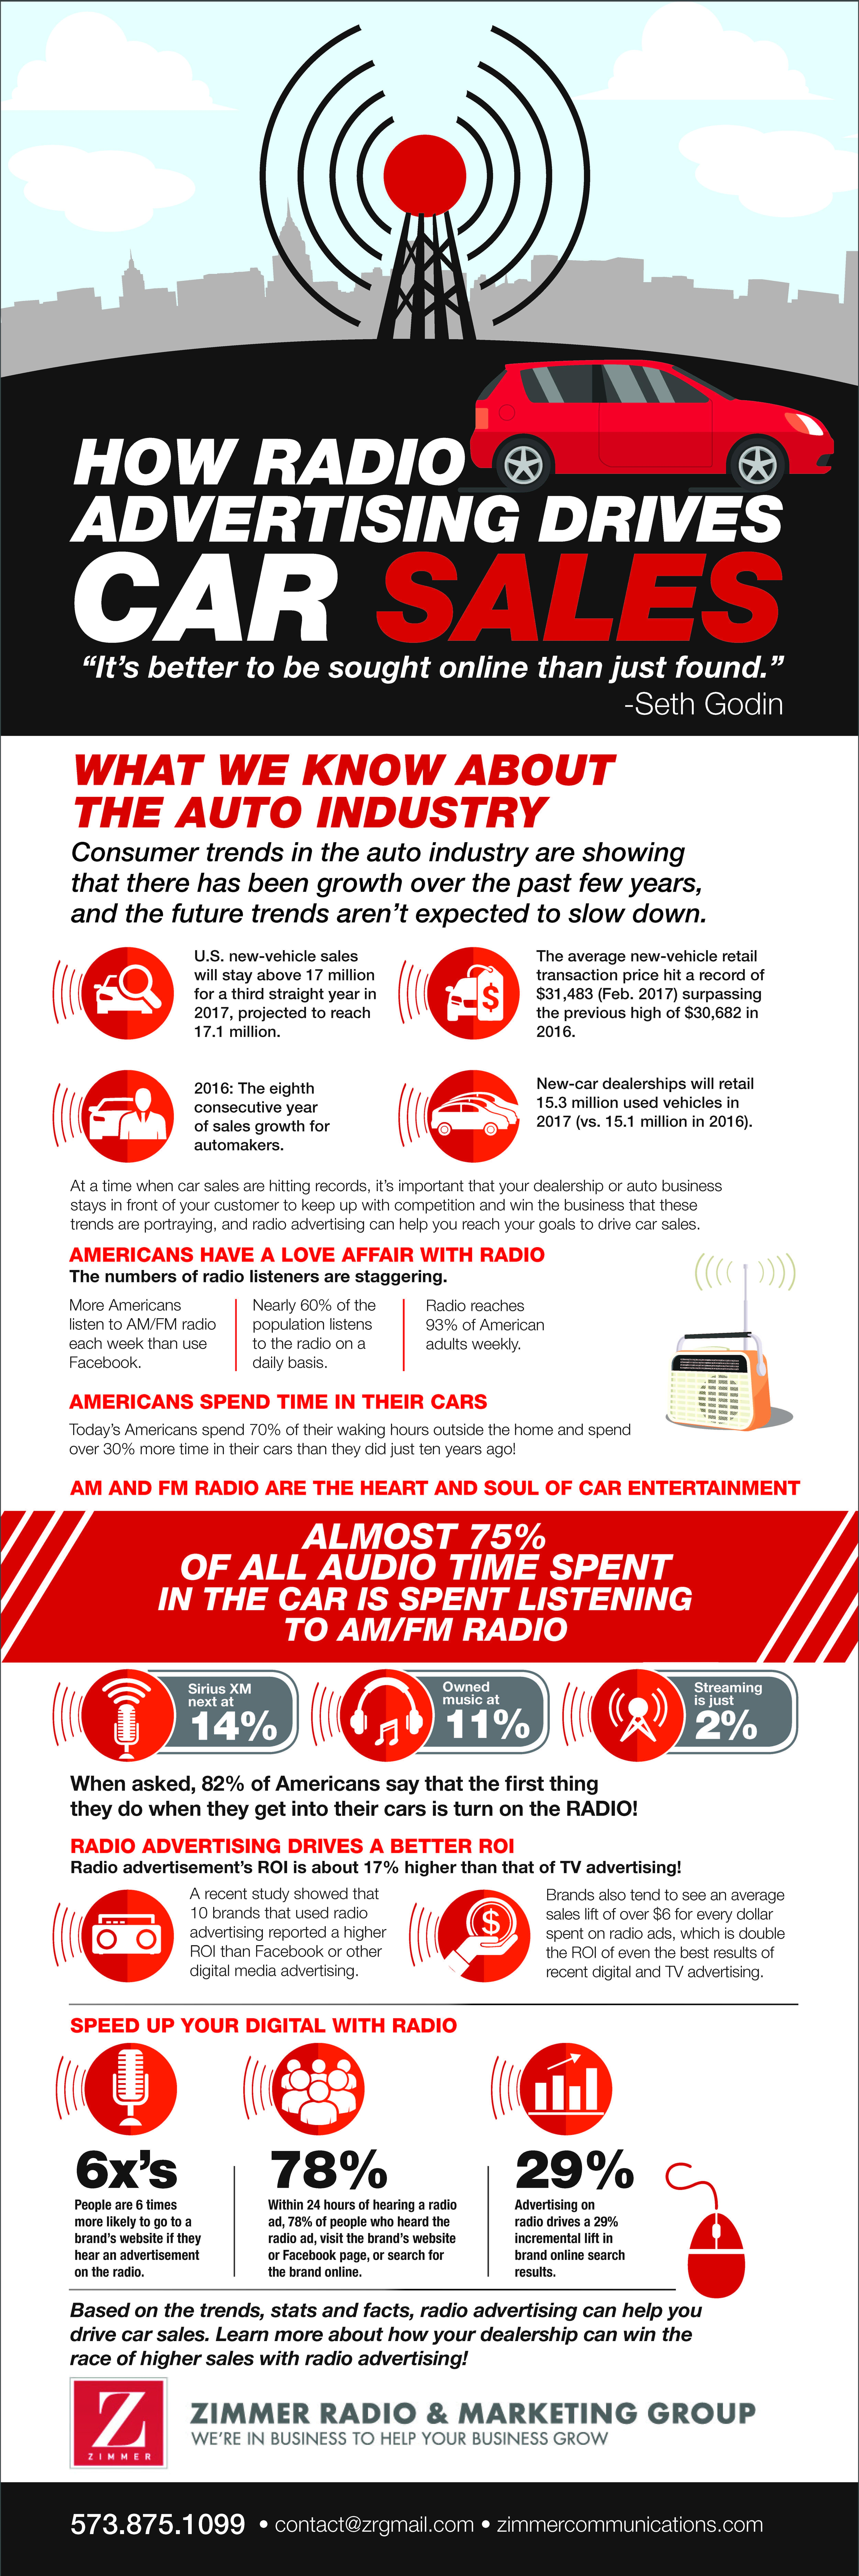 ZimmerRadio_Infographic_Radio-AutoIndustry_FINAL.jpg